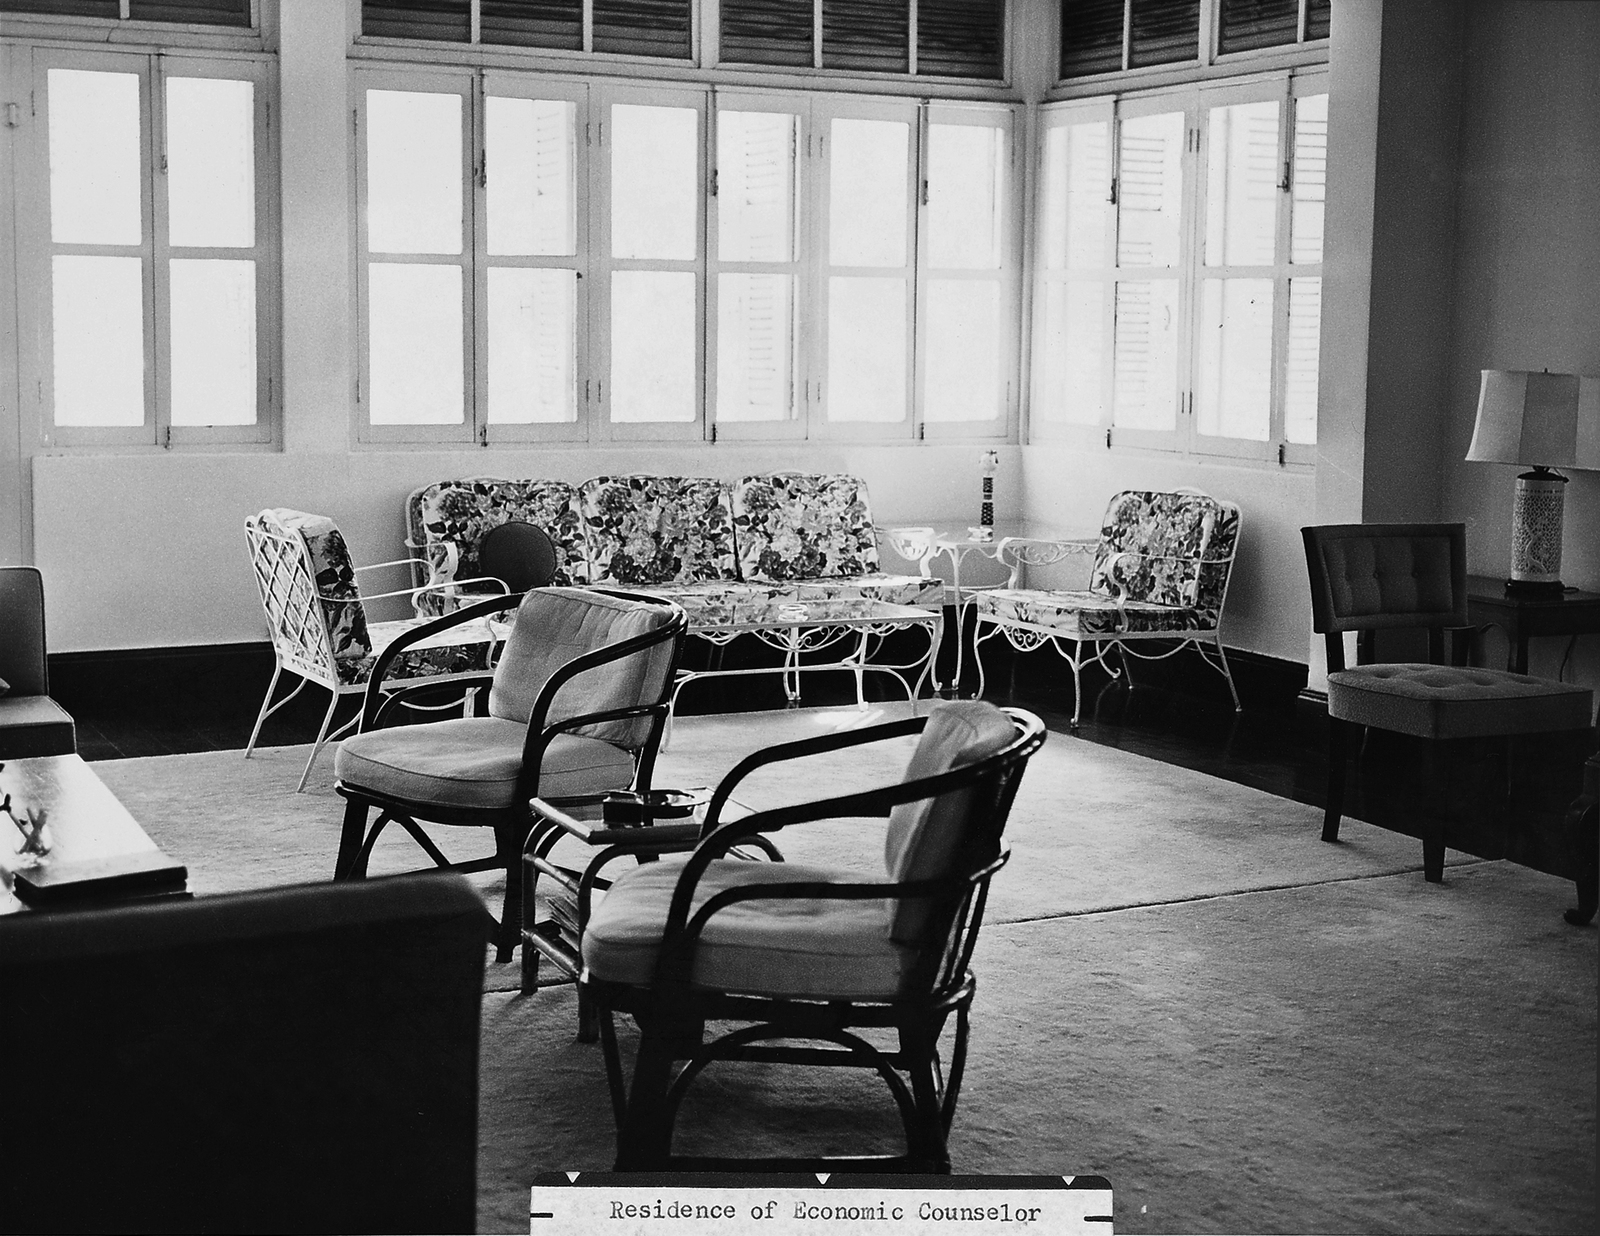 Bangkok - Executive Level Position Residence - 1963